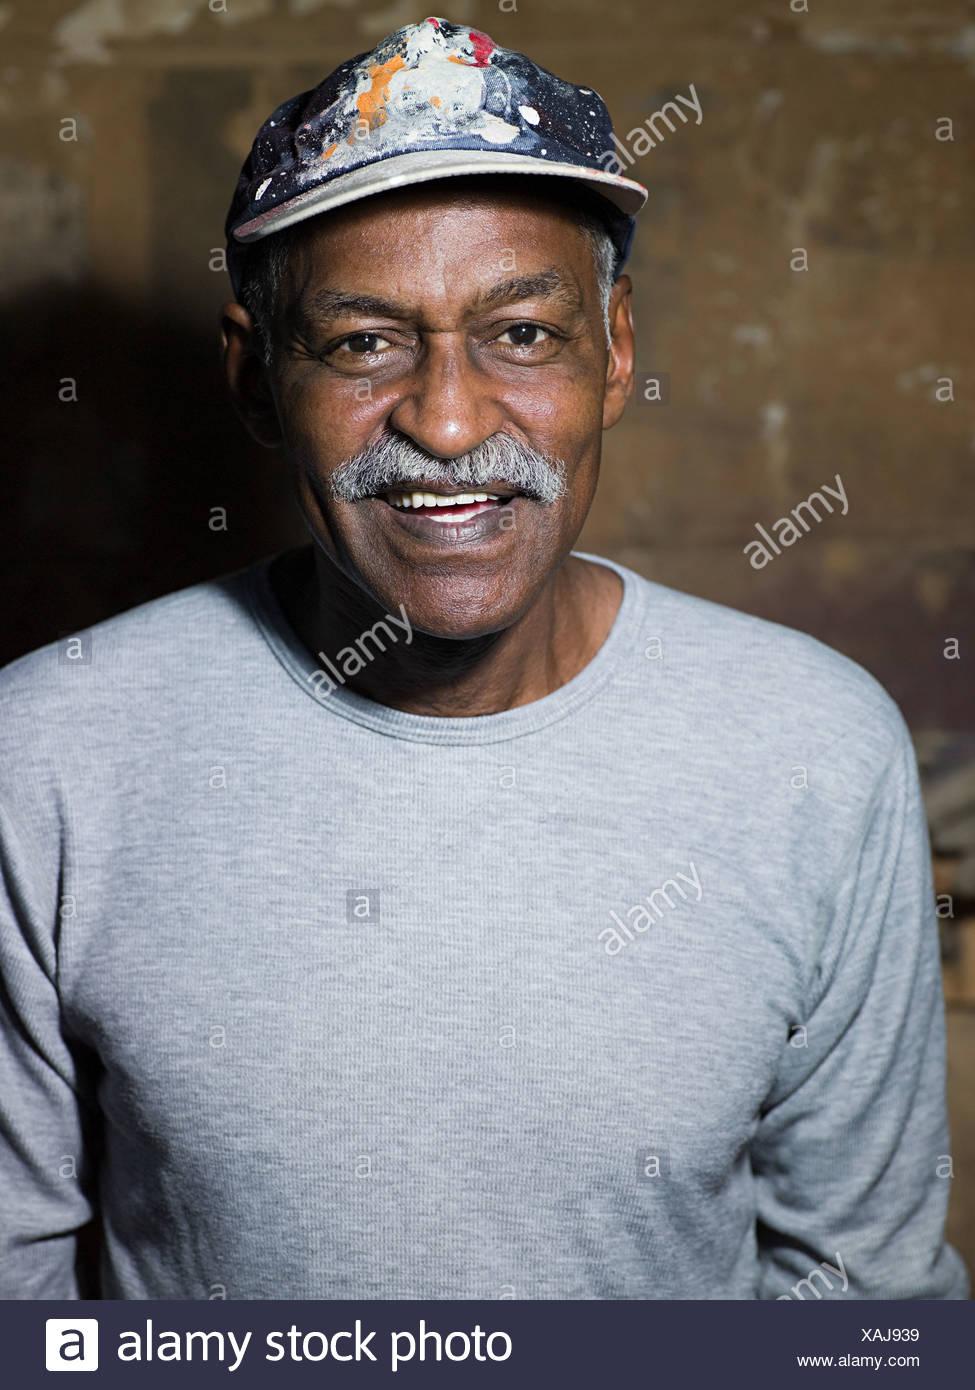 Man Wearing Baseball Hat Immagini   Man Wearing Baseball Hat Fotos ... b6e55049edf4